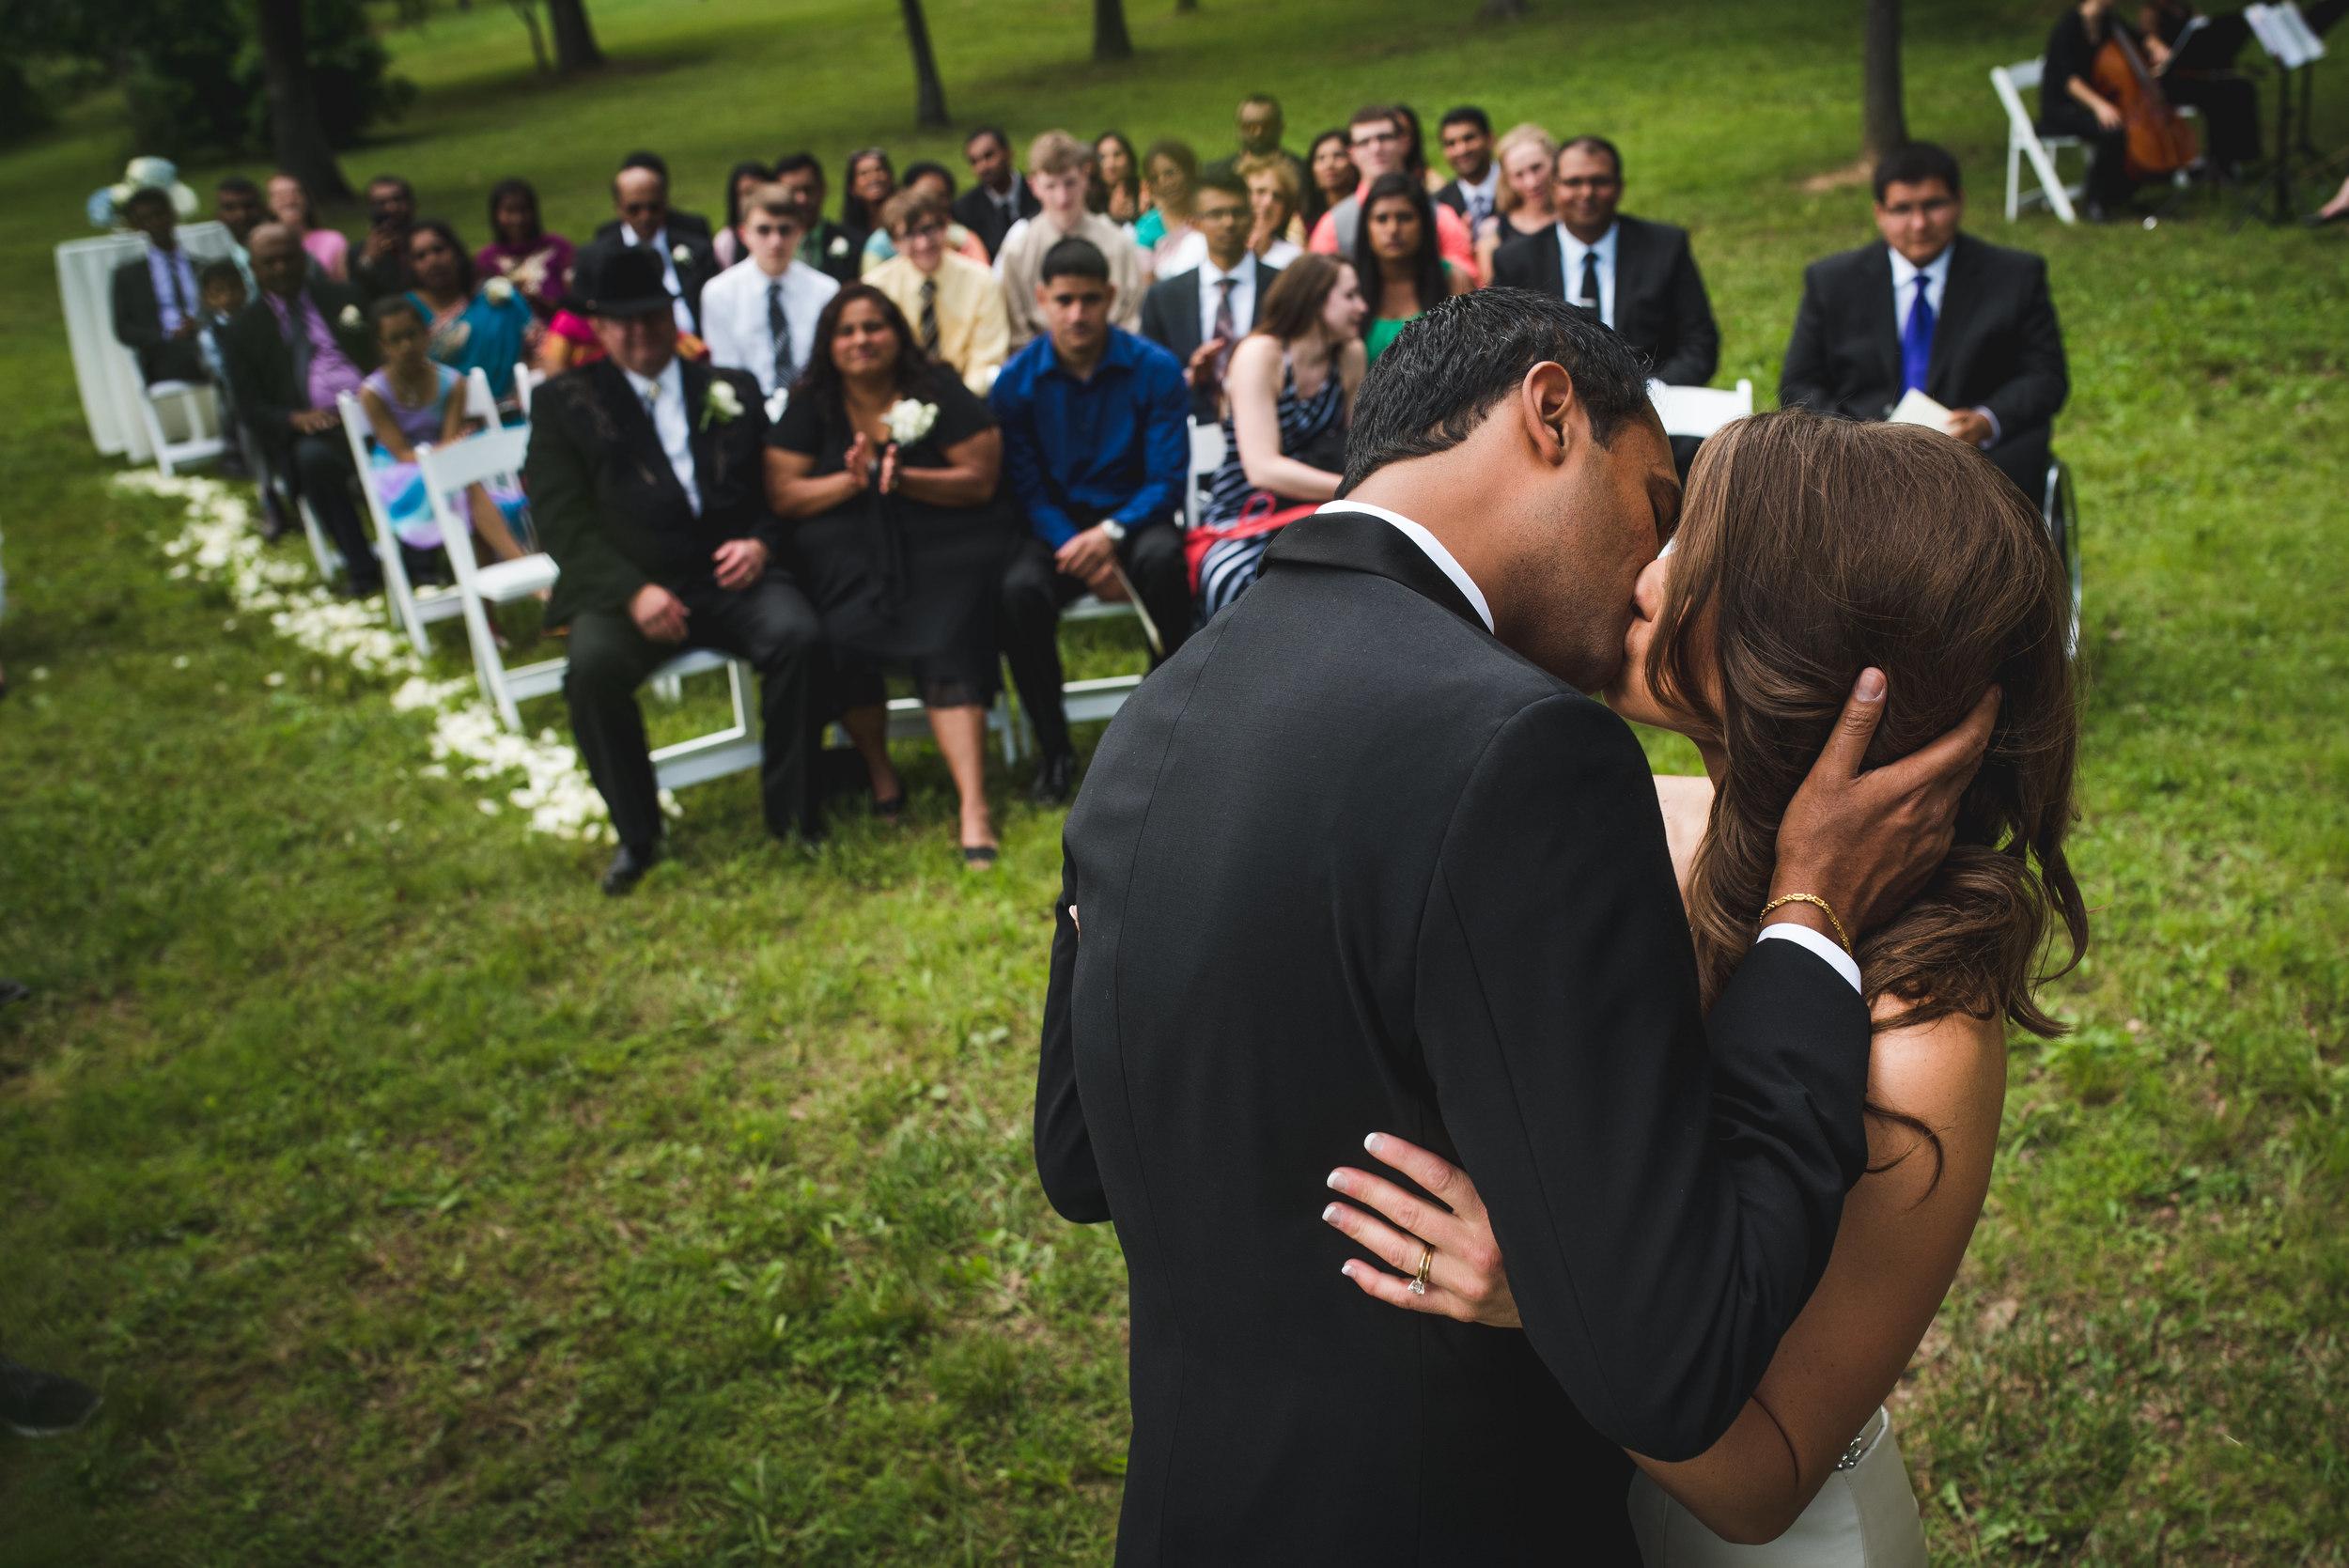 Artistic Wedding Photographer Washington DC .JPG